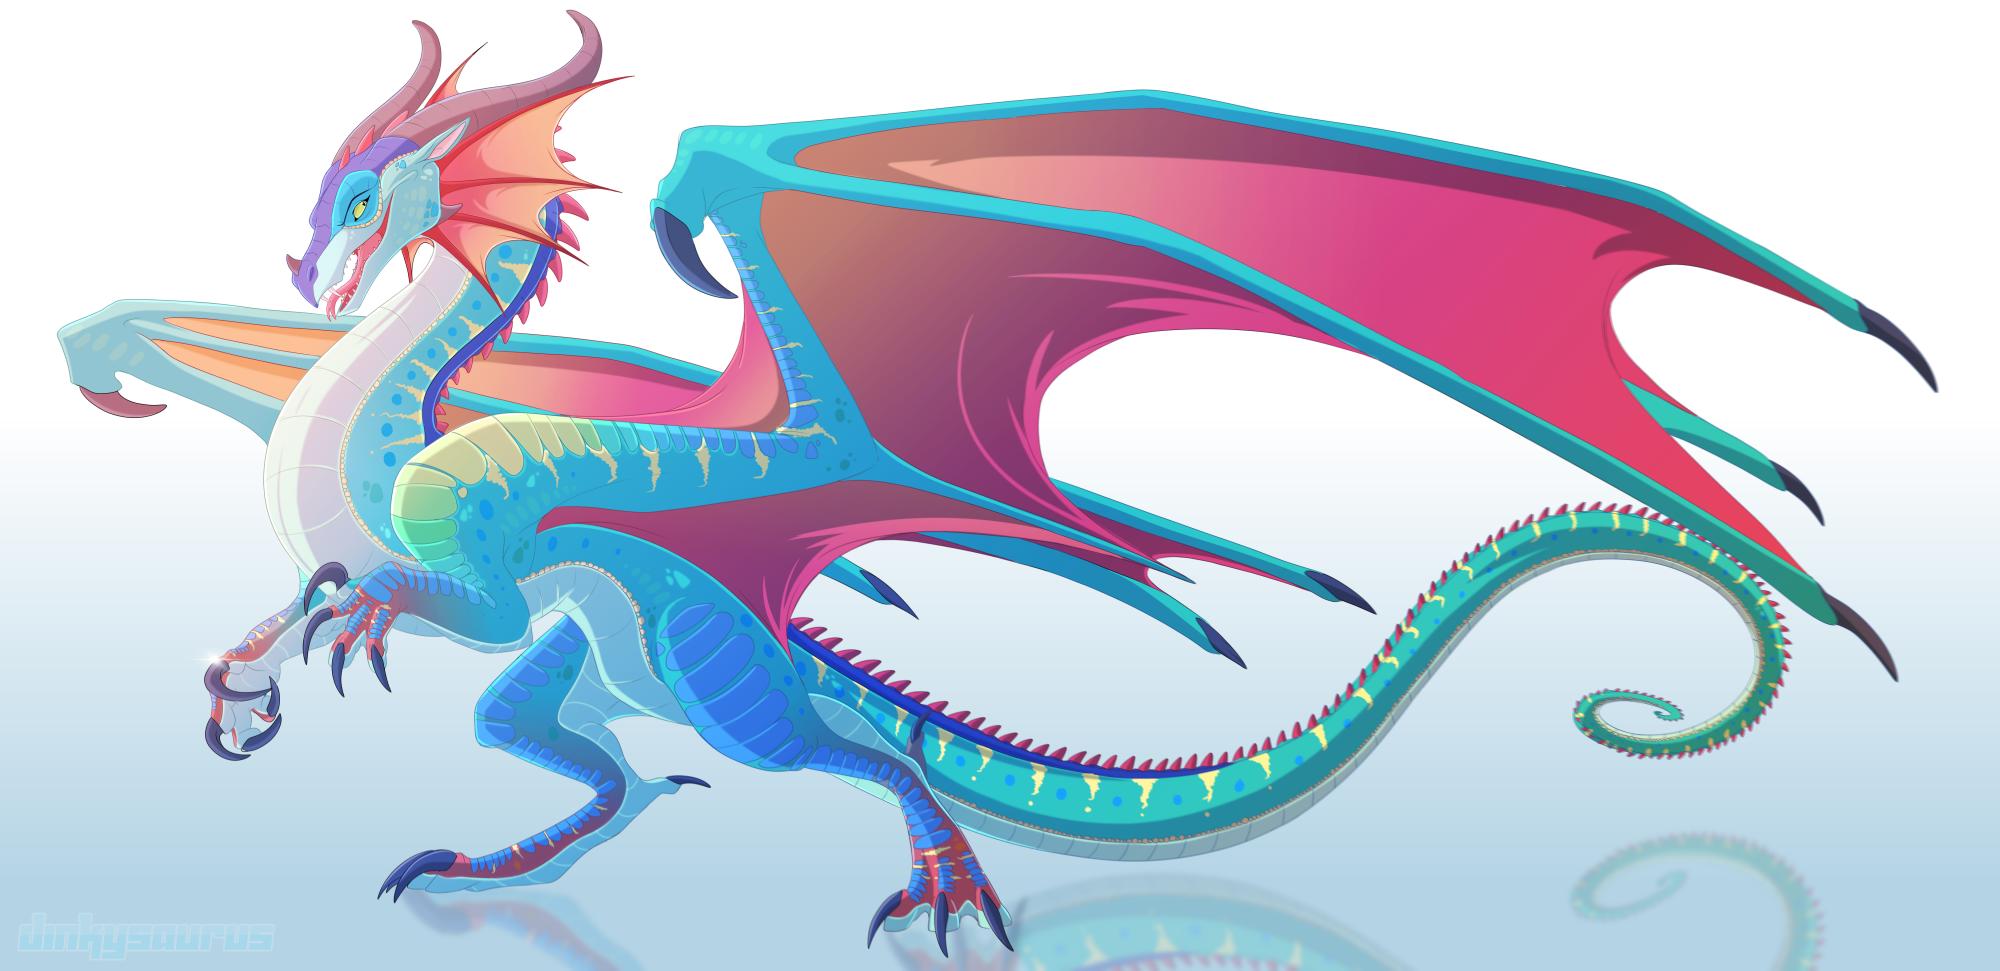 Wylandriah the Fabulous Dinkysaurus-queen-glory-of-rainwings-wof-fanart